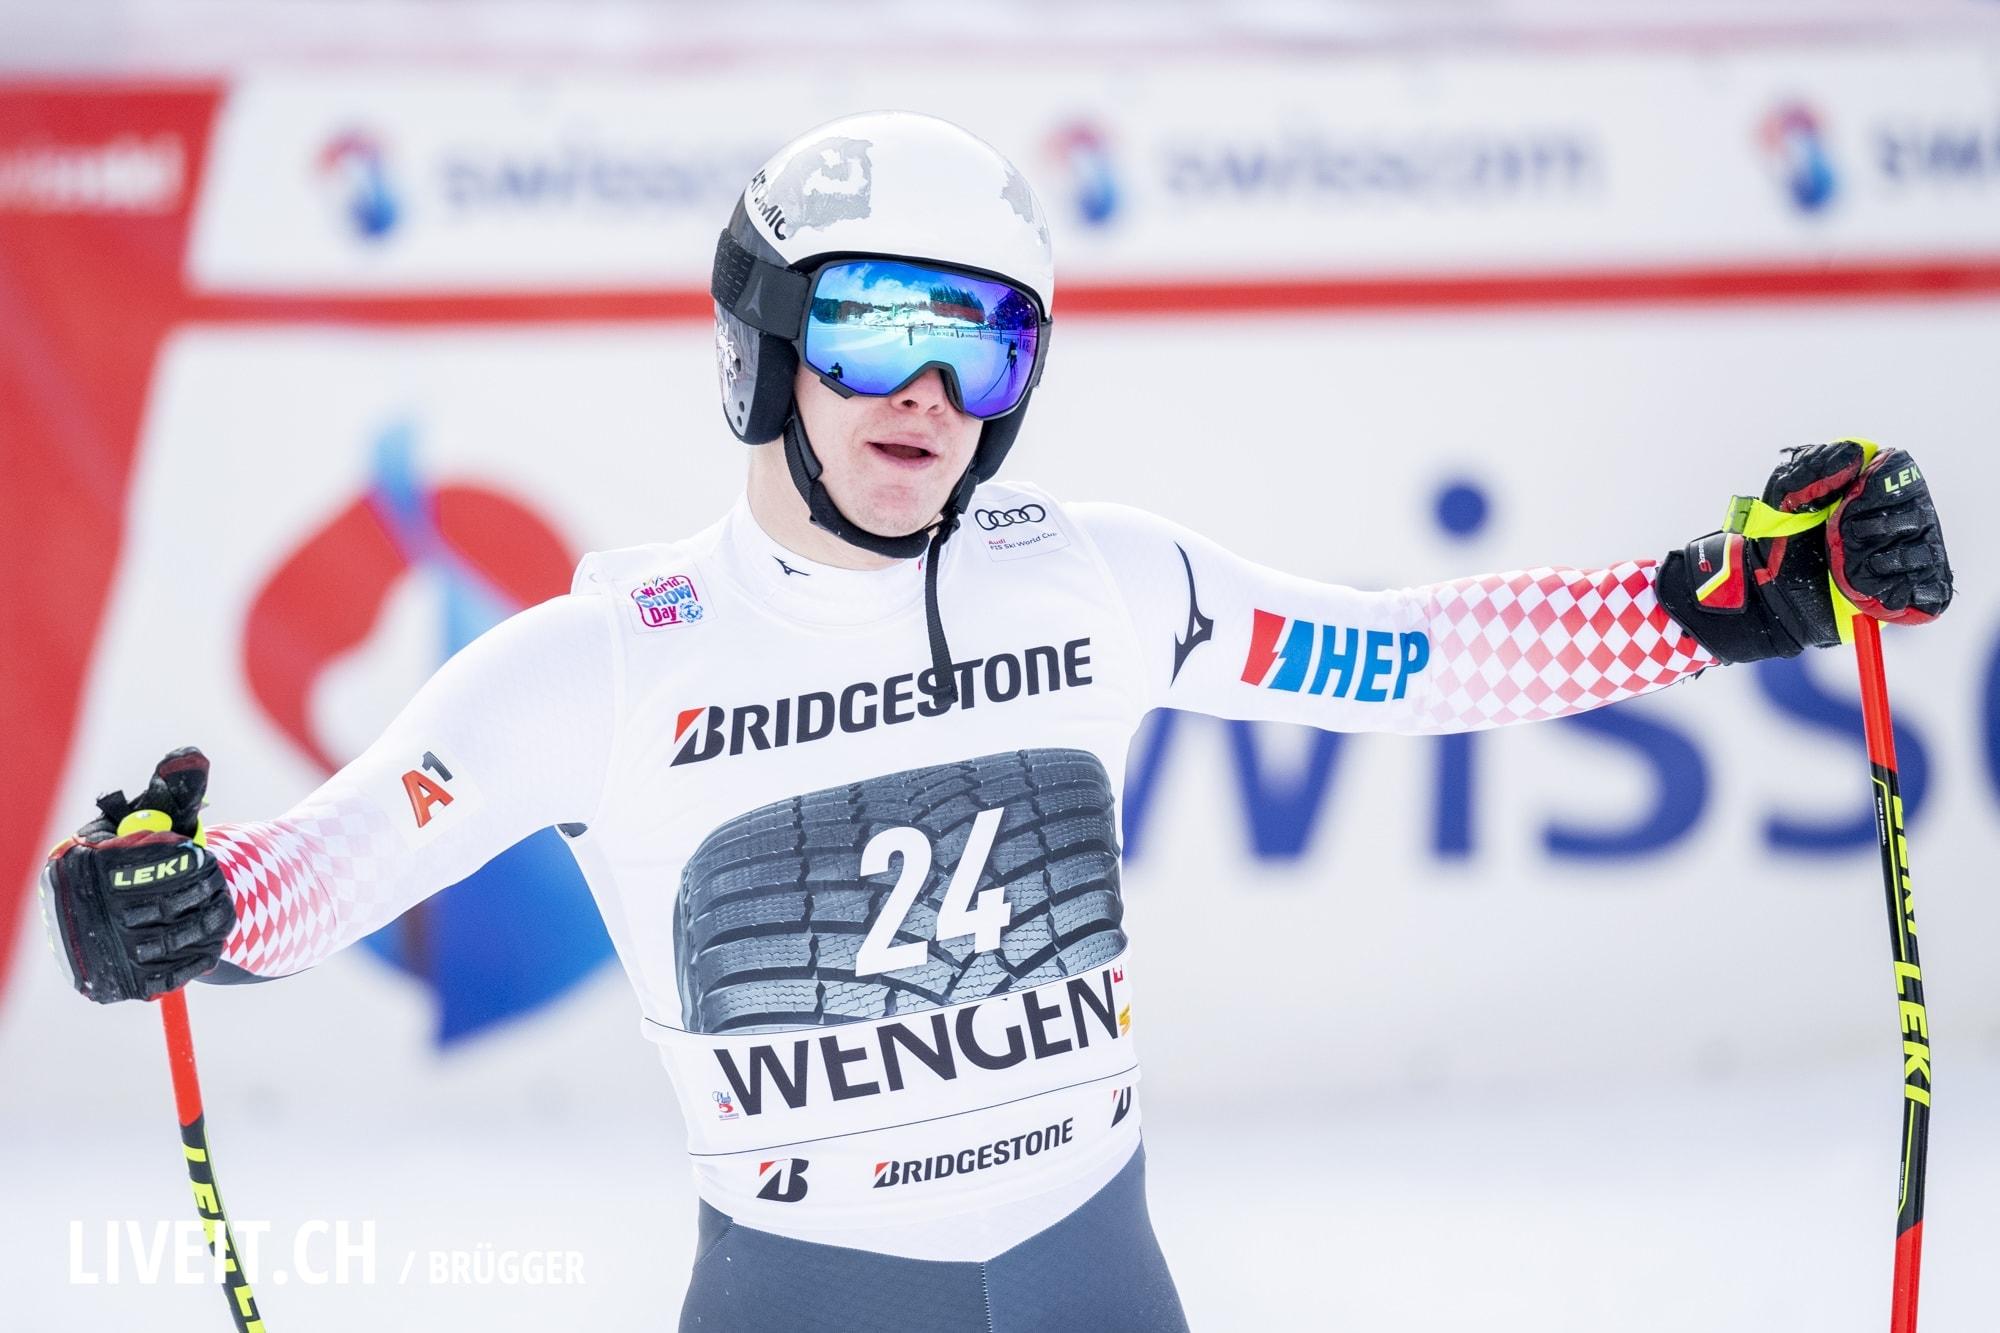 Filip Zubcic (CRO) fotografiert am Freitag, 18. Januar 2019 am Lauberhornrennen in der Disziplin: Slalom Alpine Kombination. (Fotografiert von Dominic Bruegger liveit.ch)